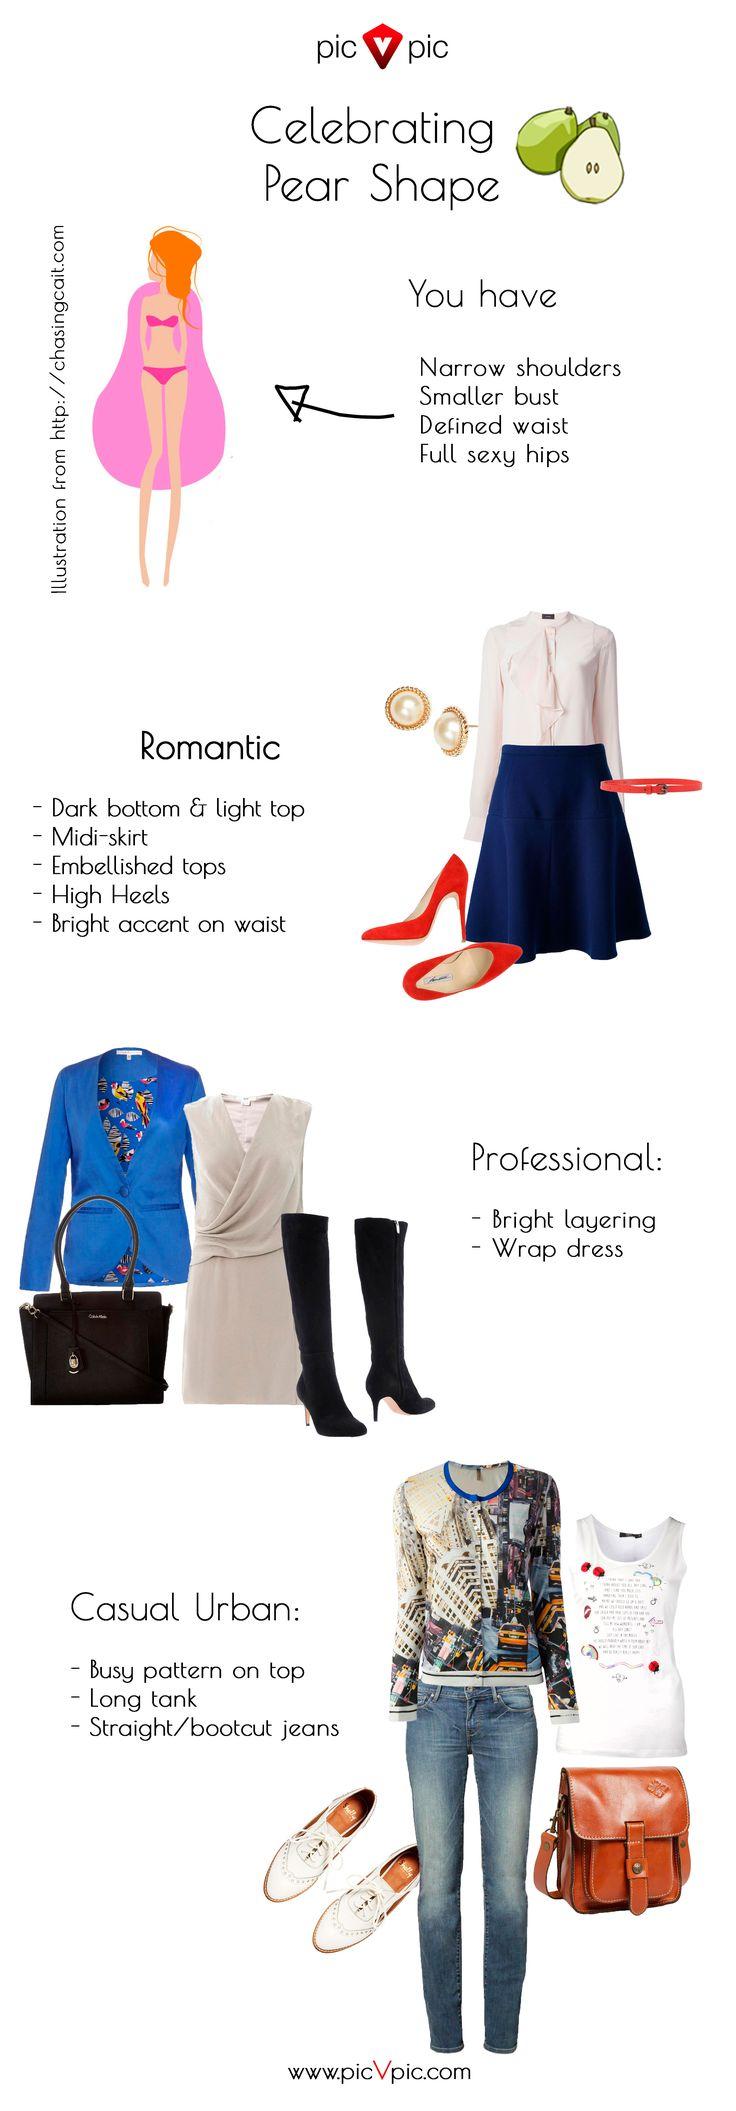 Wardrobe essentials for pear-shaped ladies